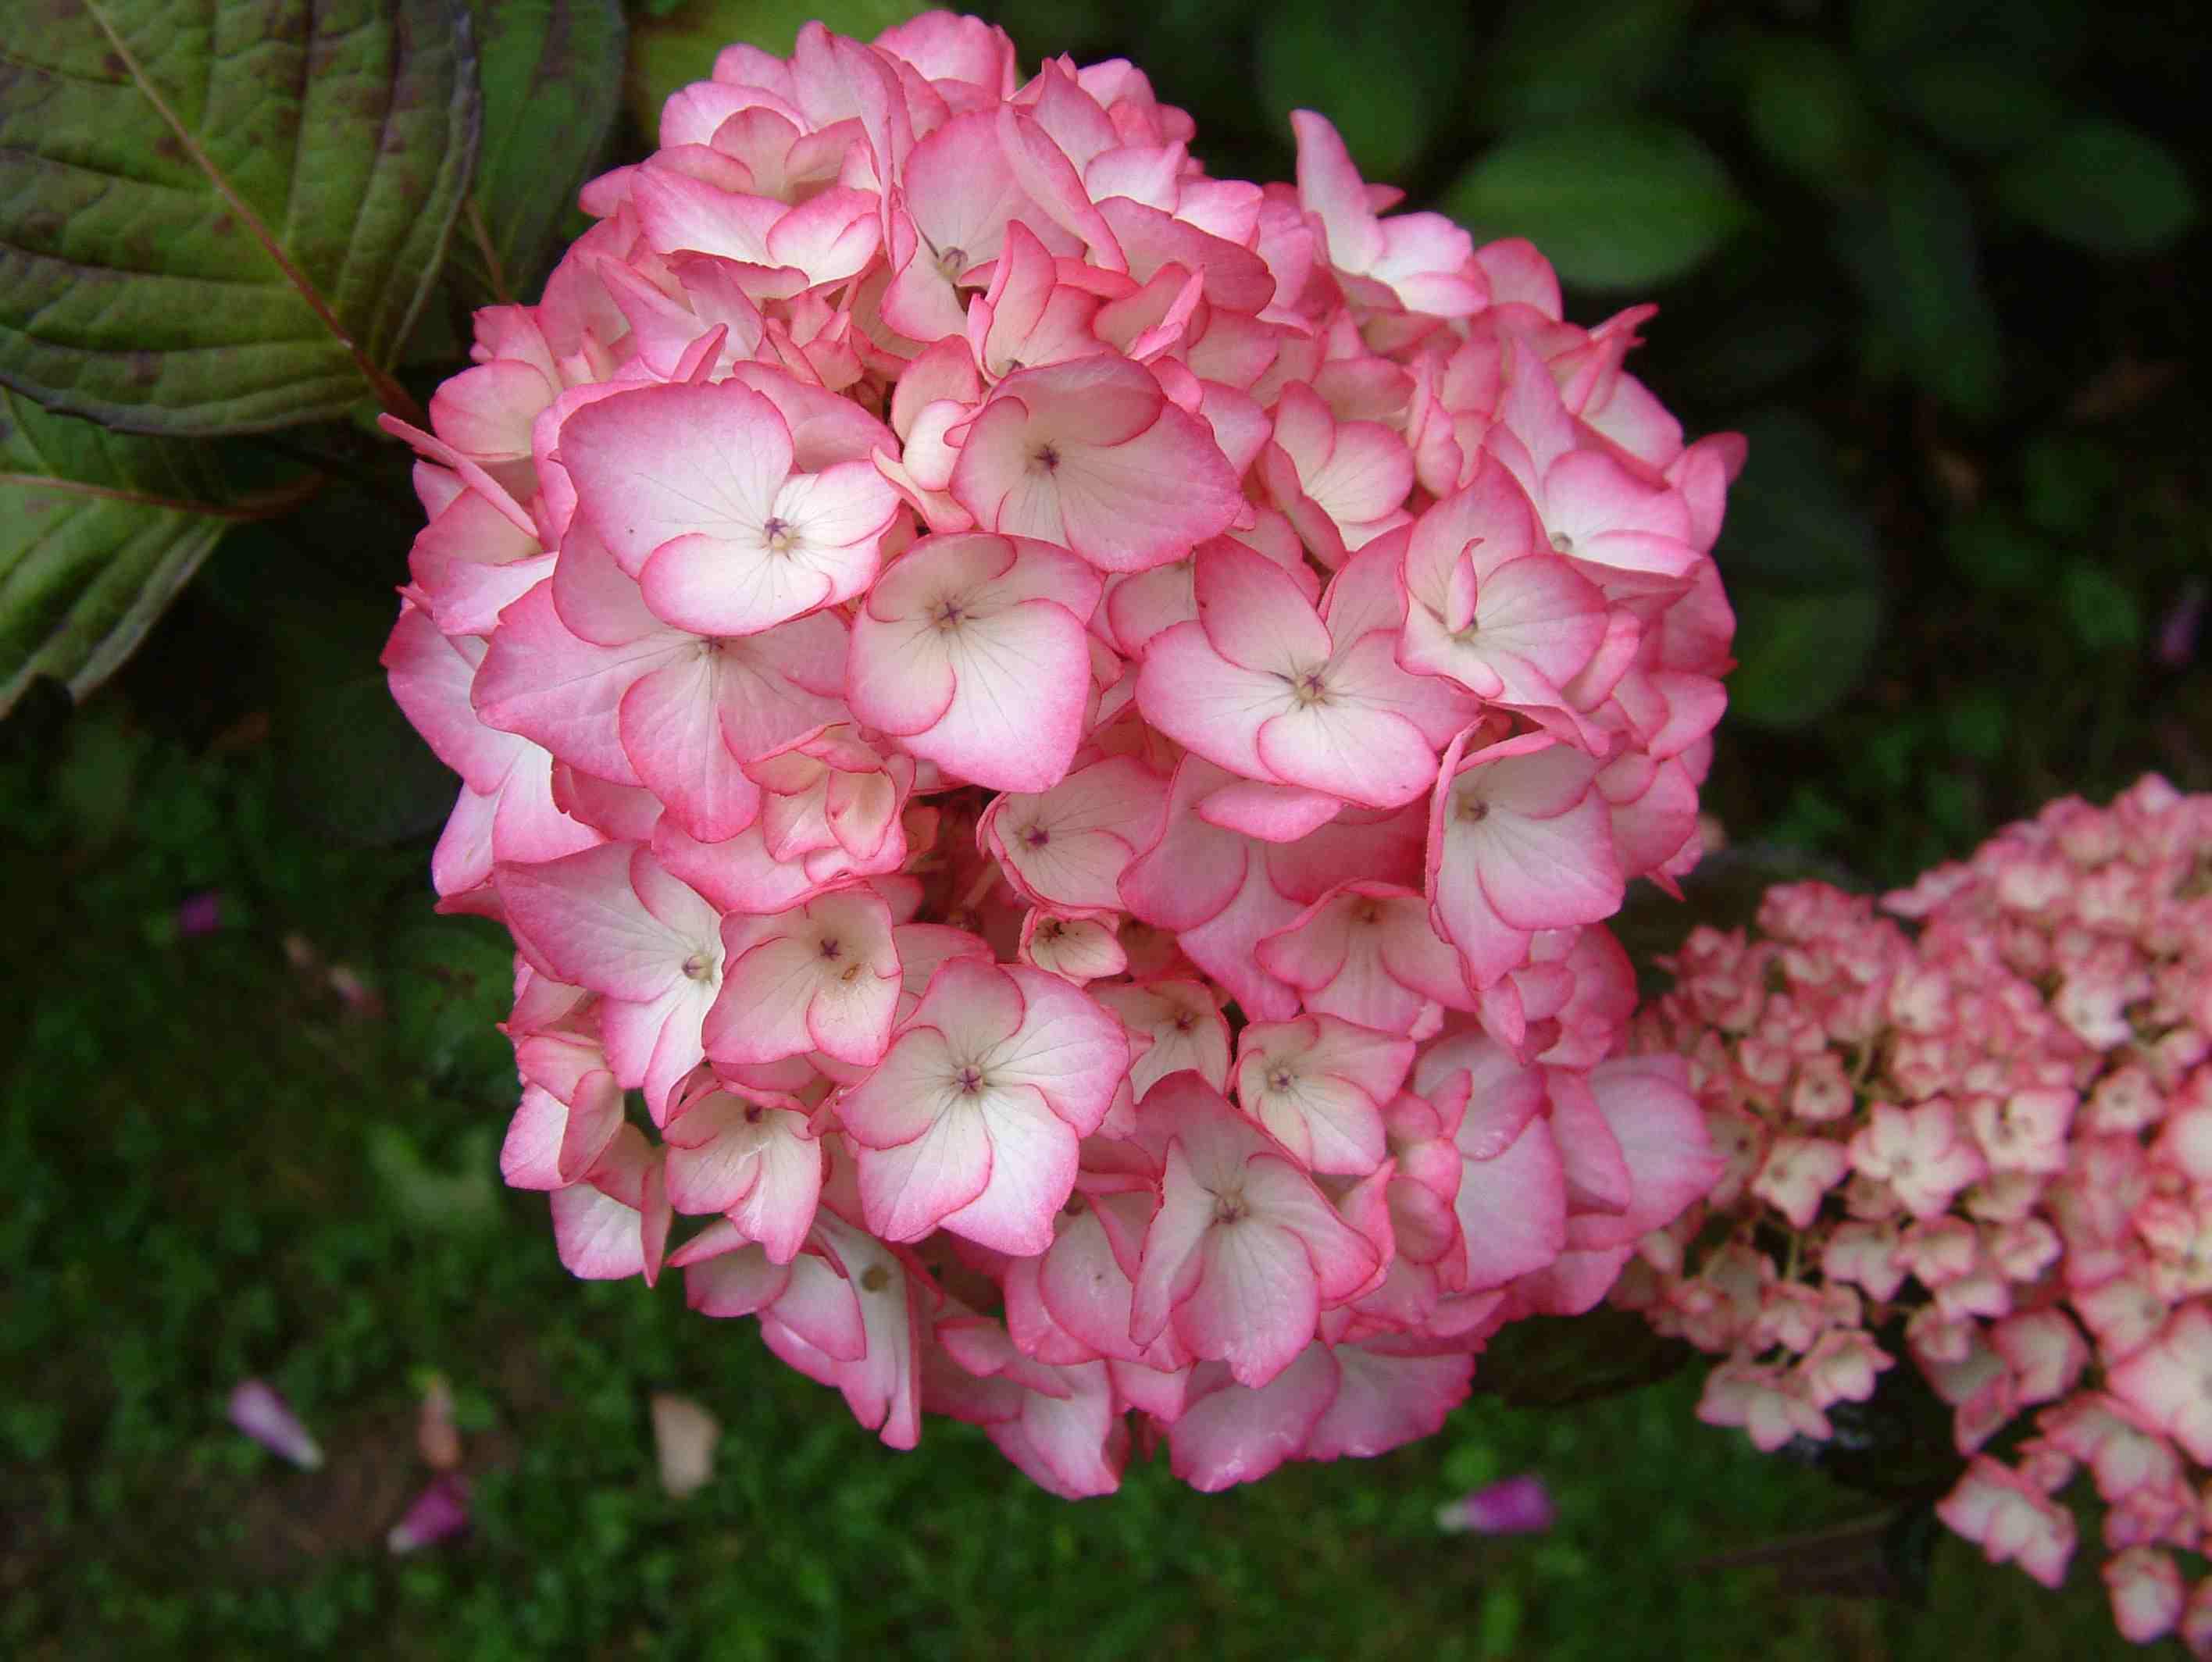 Hydrangea Macrophylla 'sabrina' 2 Hydrangeaceae